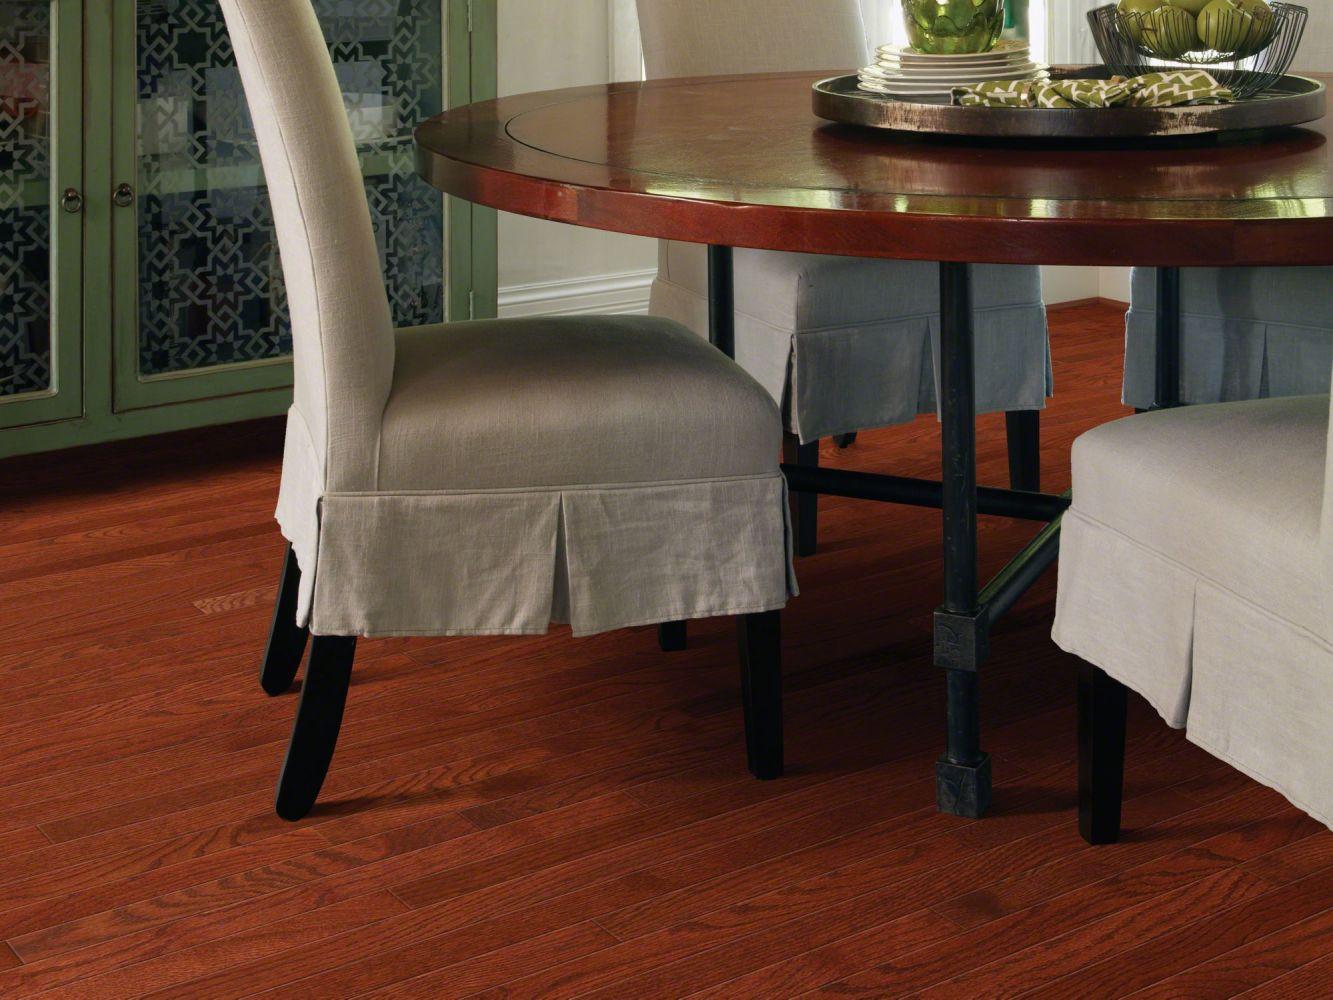 Shaw Floors Dr Horton Blairsville 2.25 Cherry 00947_DR649